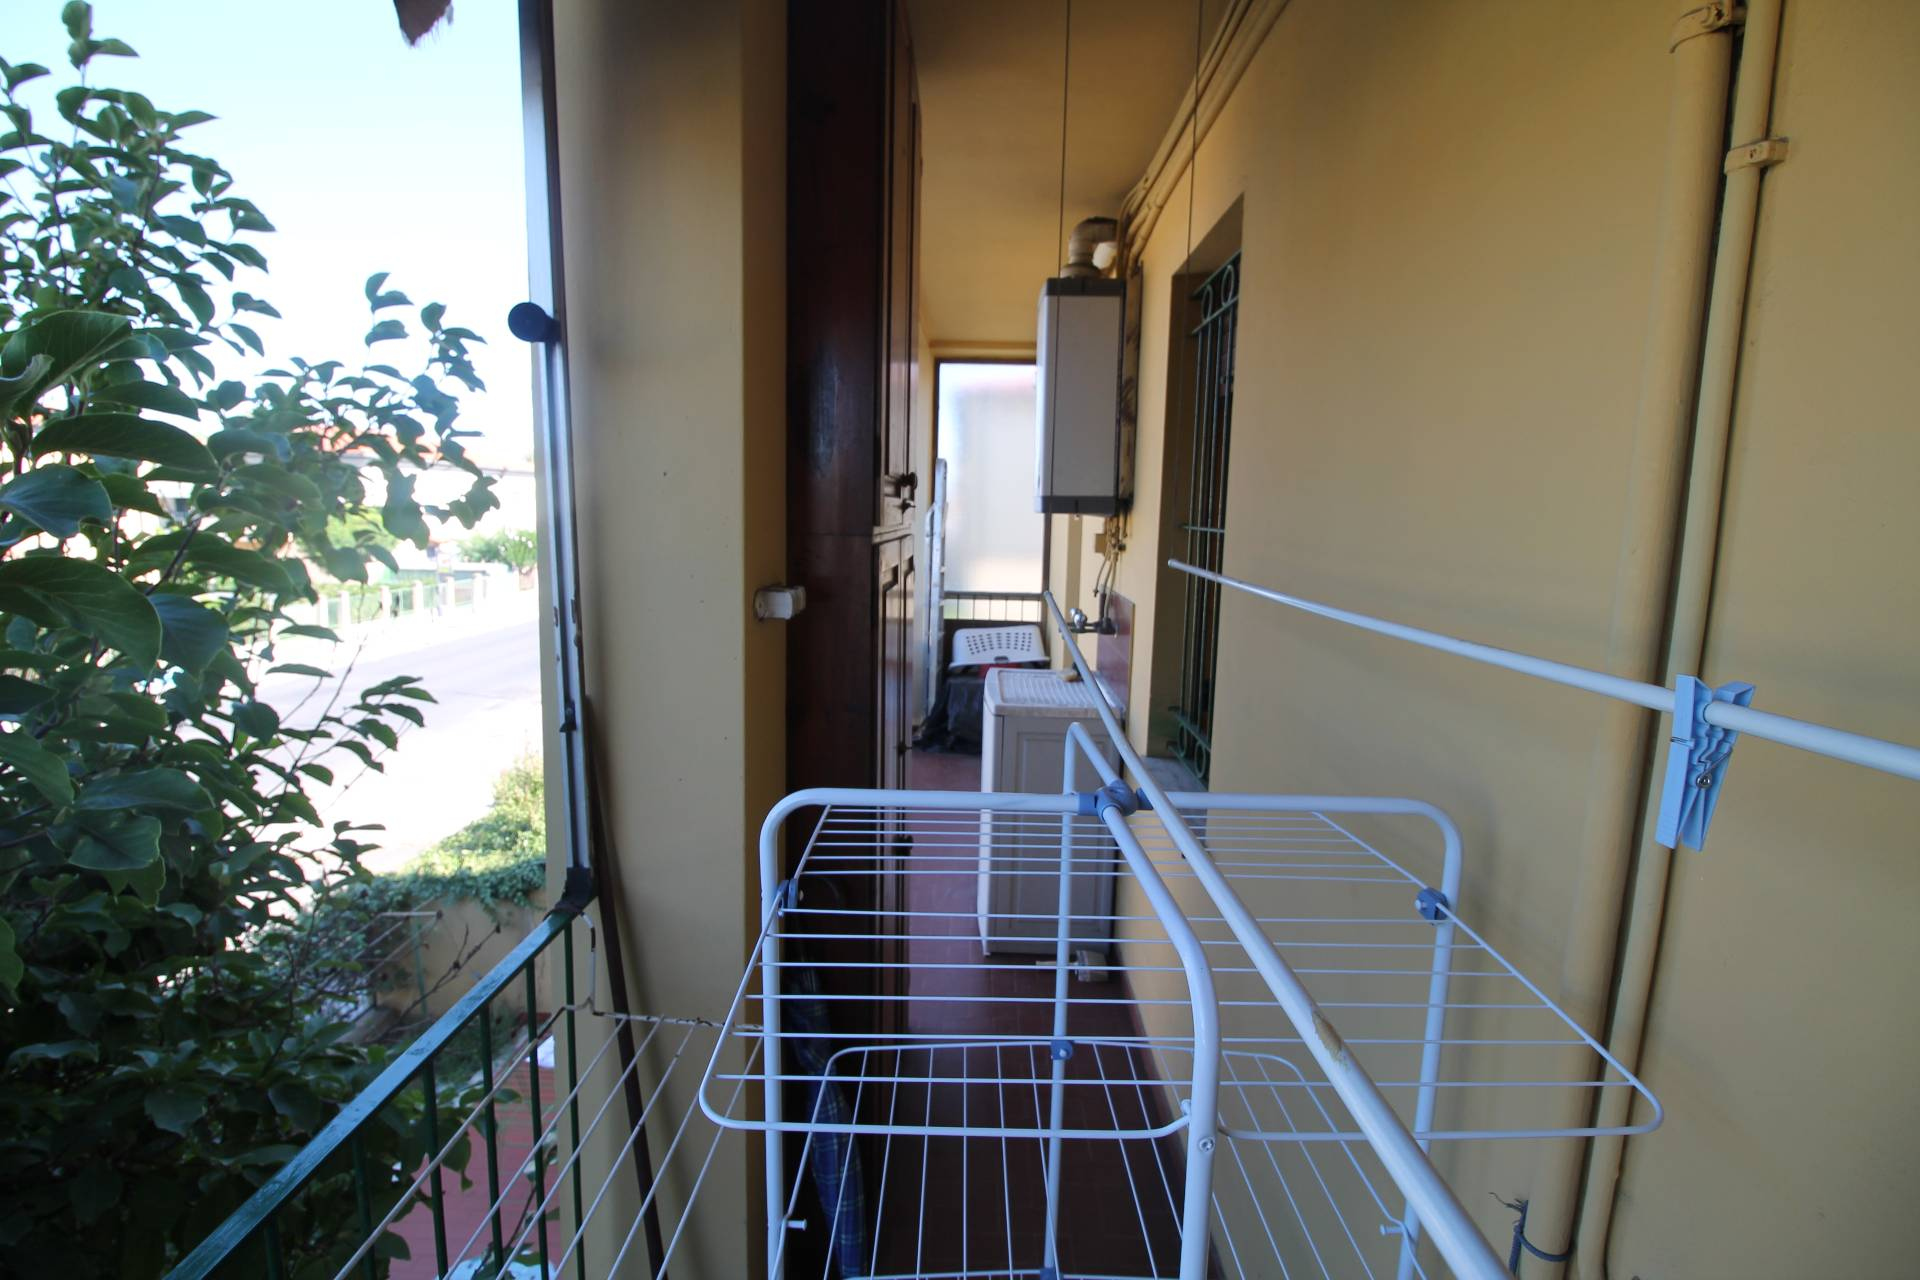 Appartamento in vendita, rif. v2413b